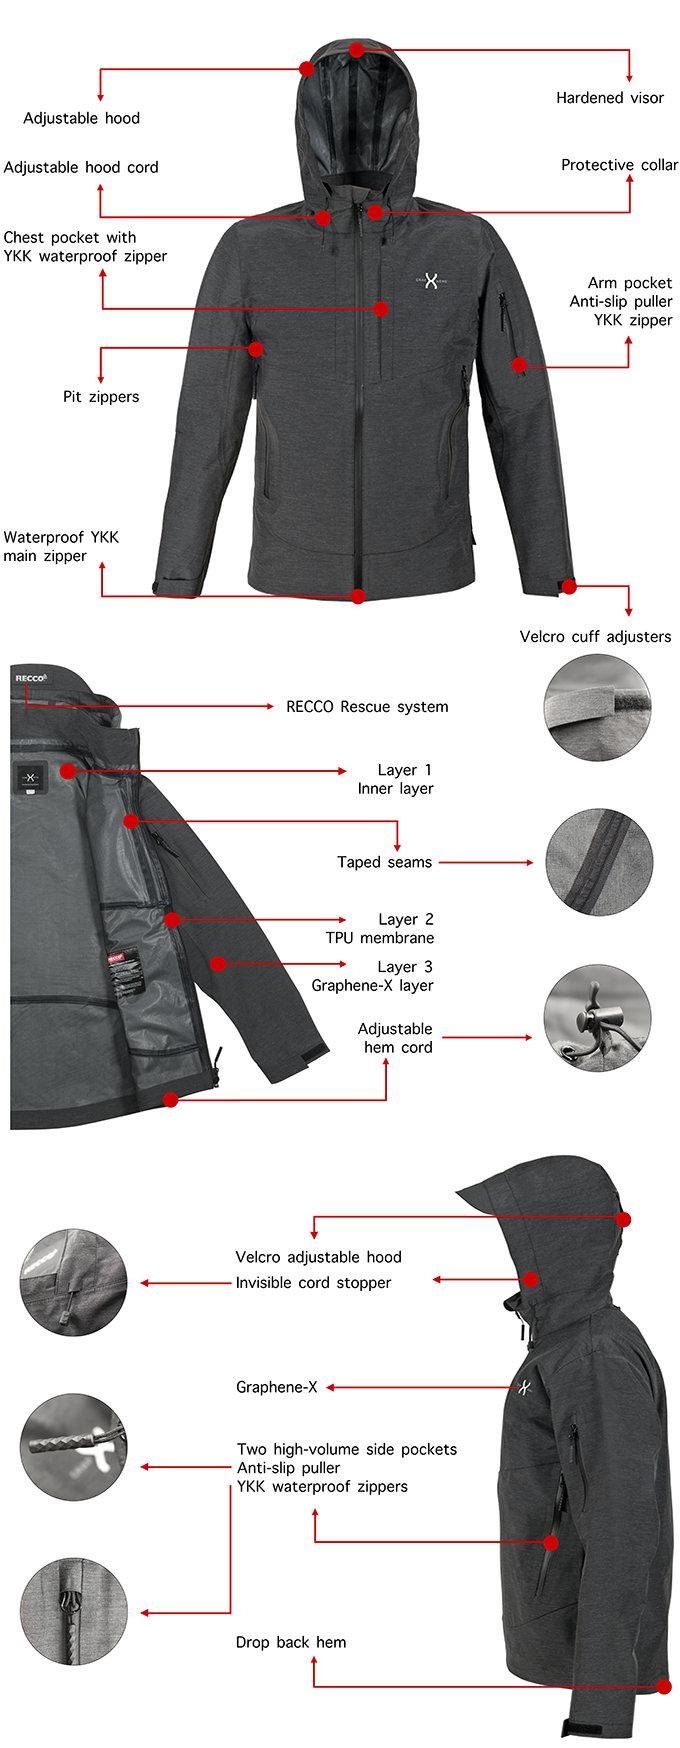 Graphene-X jacket